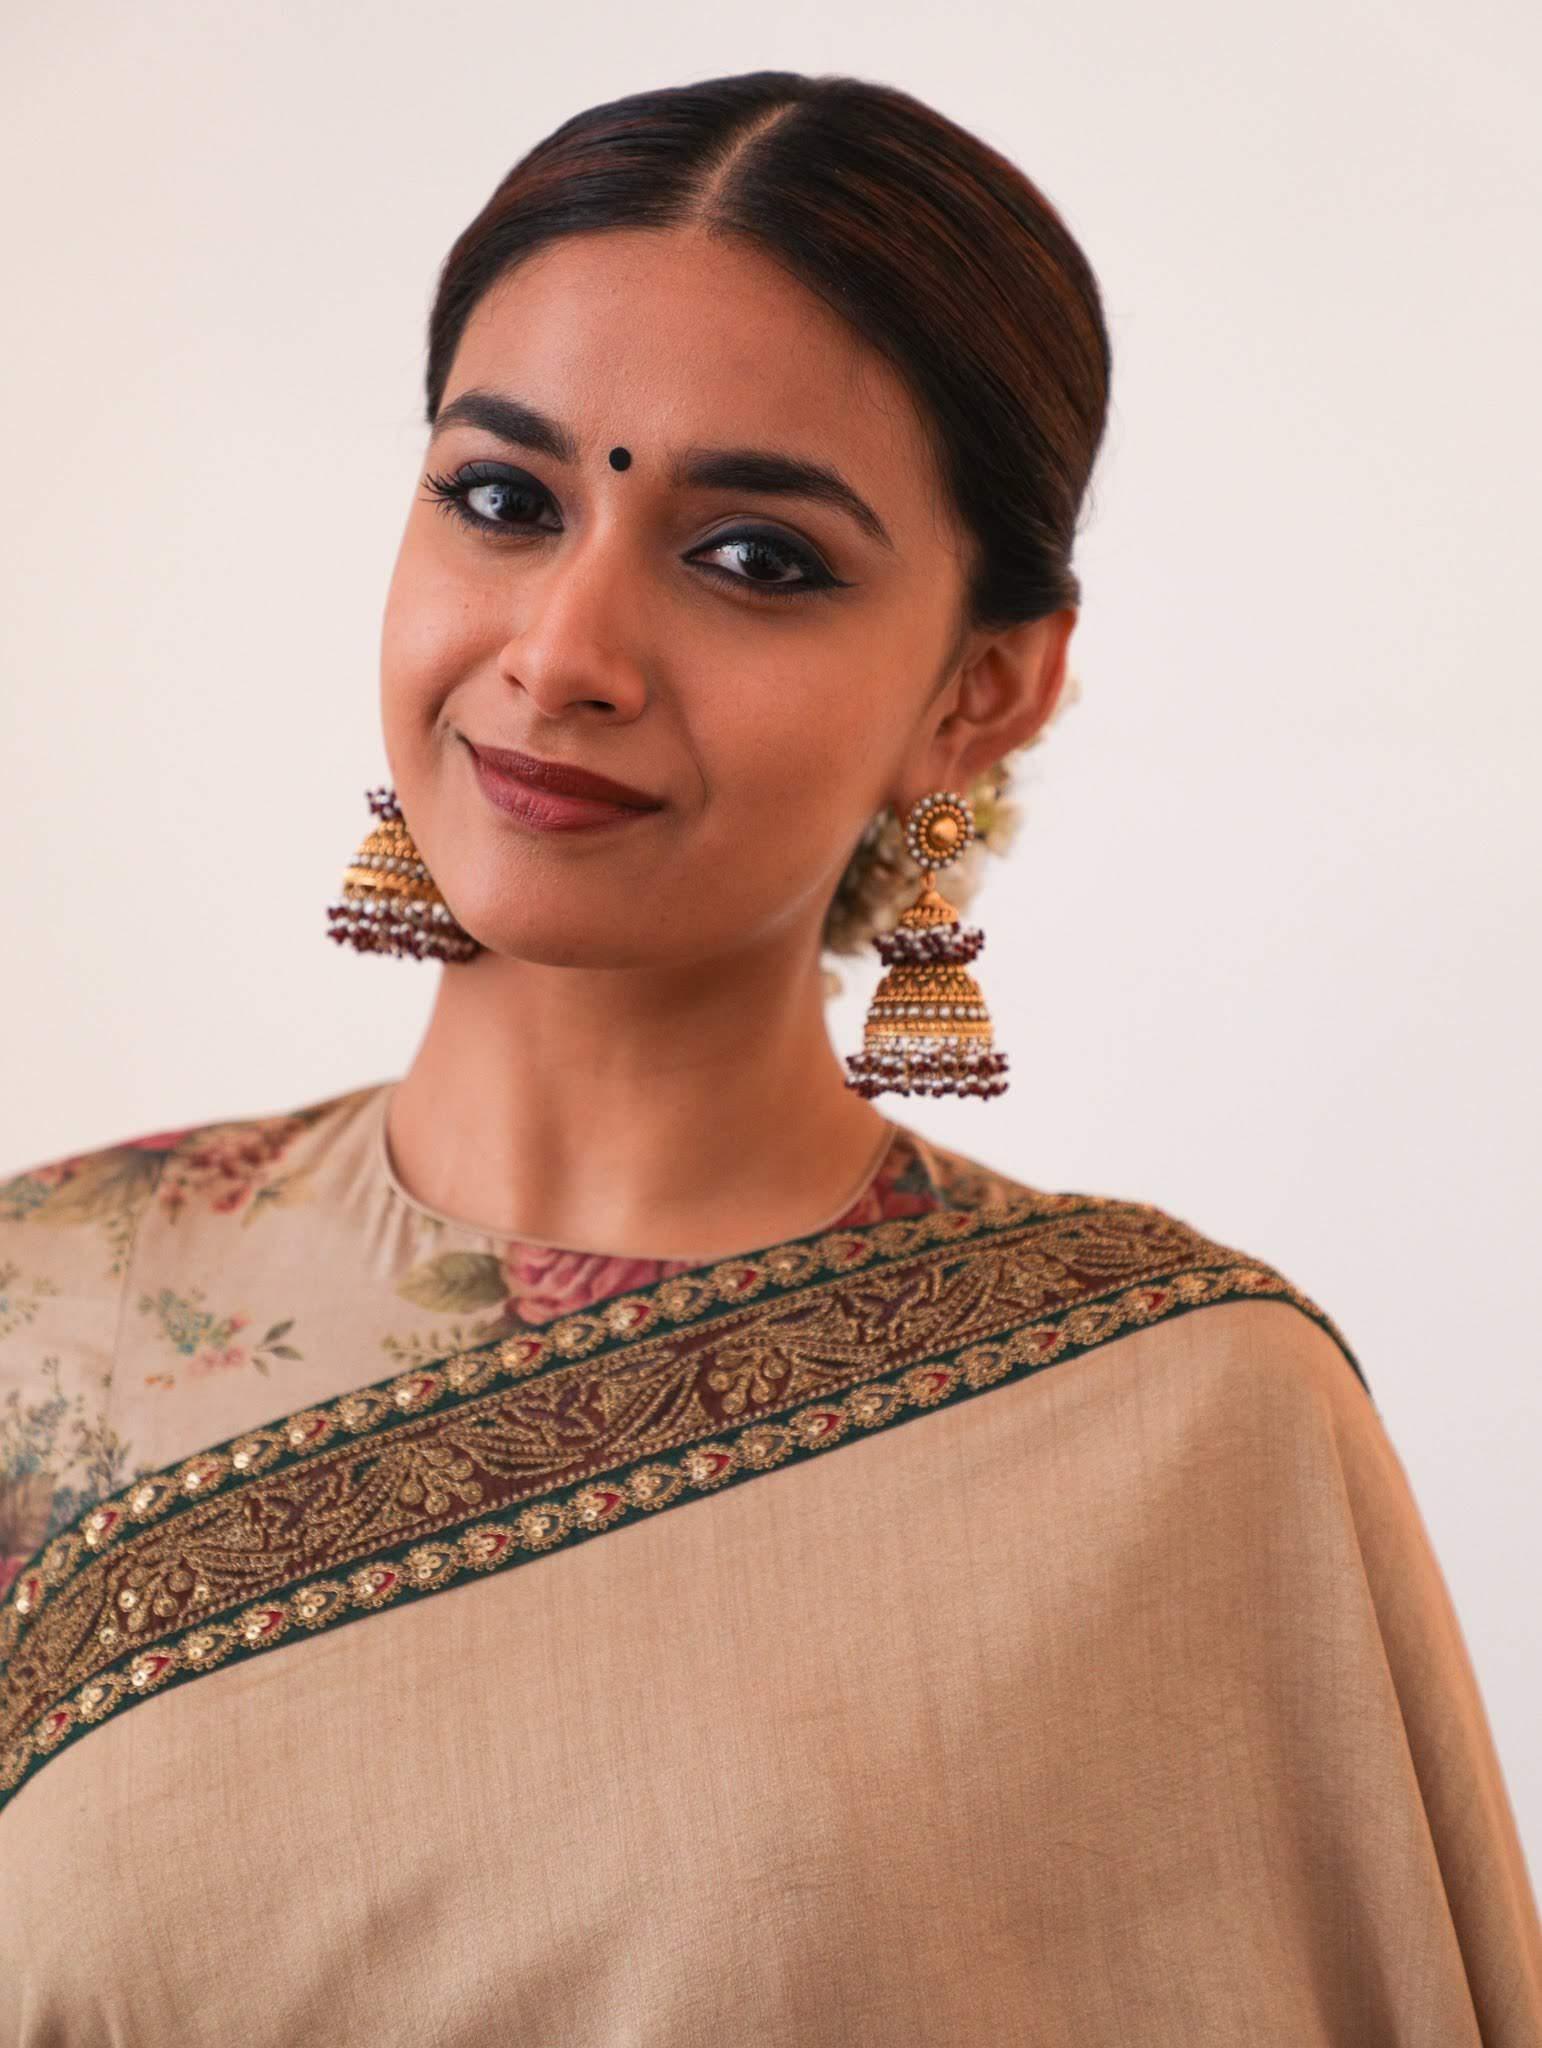 Keerthi-Suresh-Images-HD-23